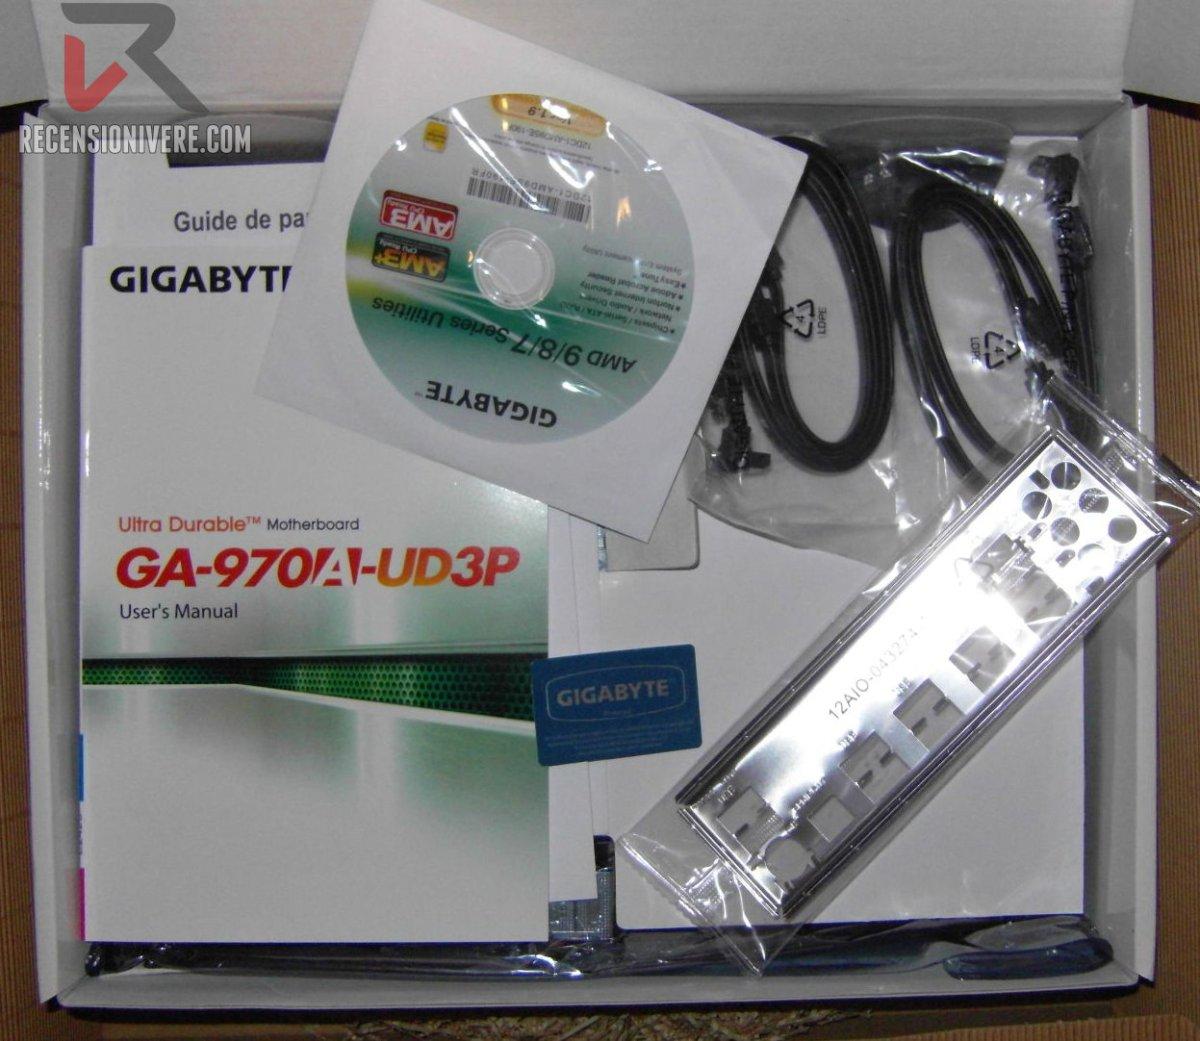 recensionivere_GA-970A-UD3P_005